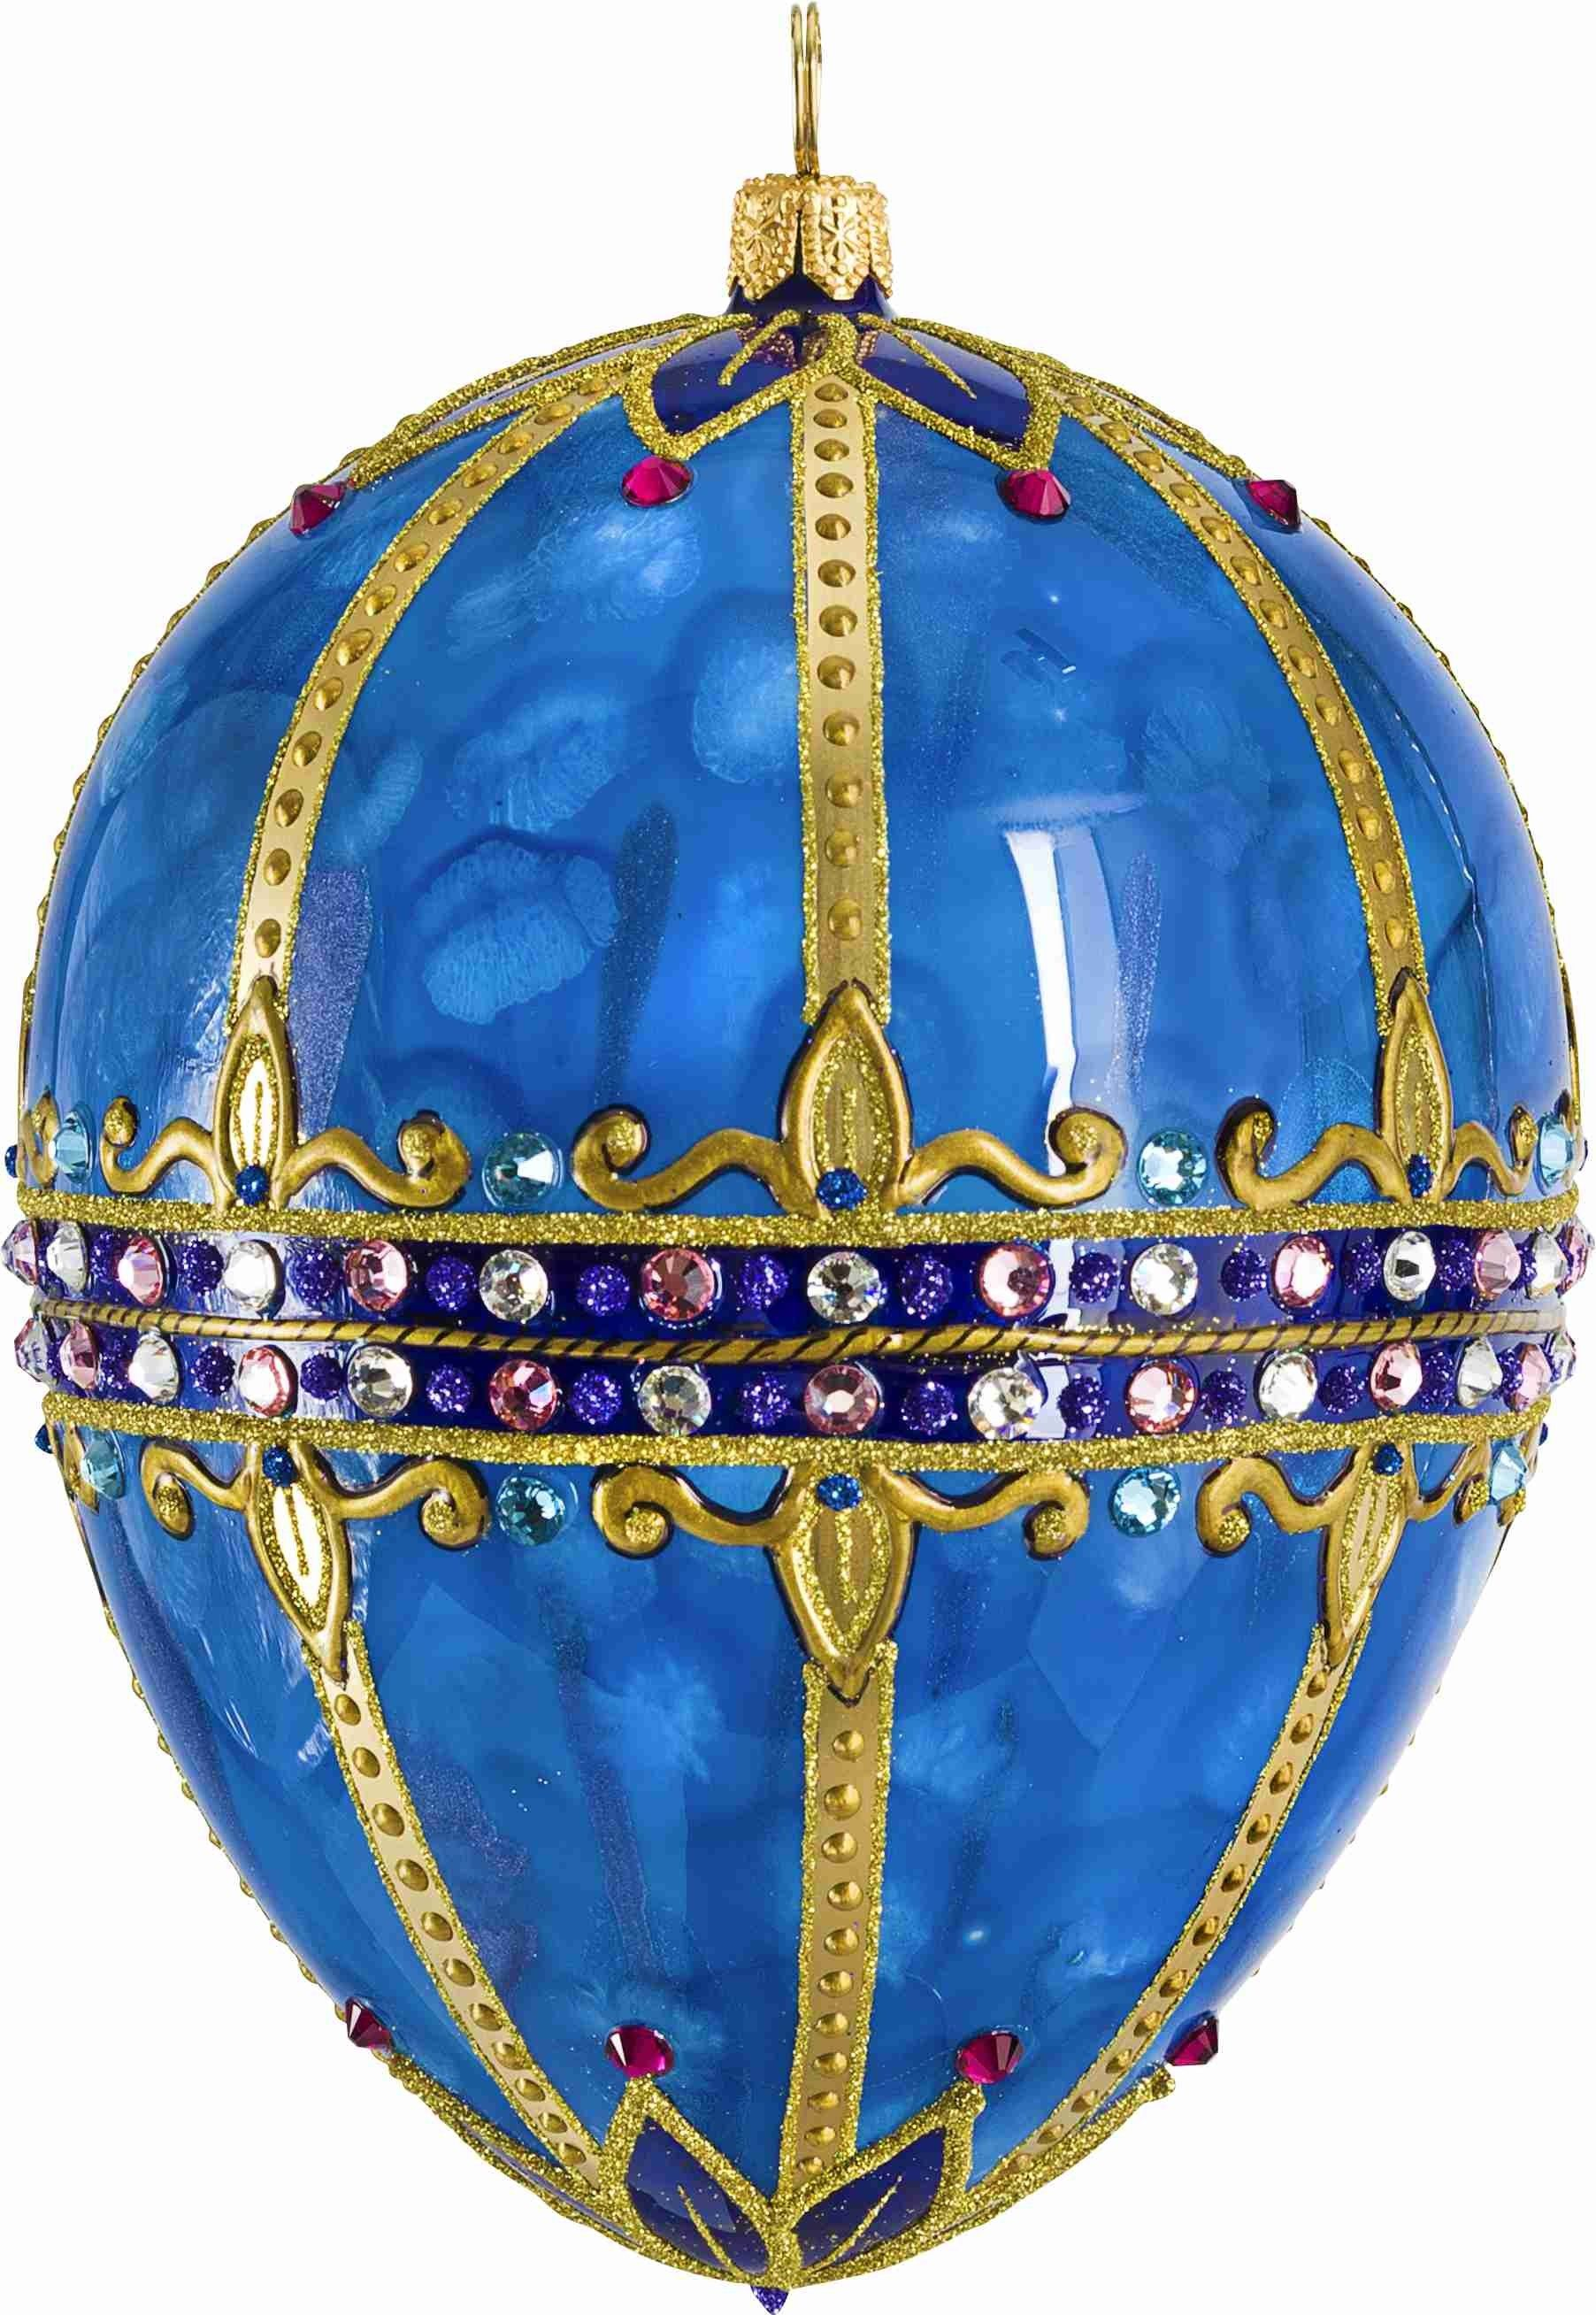 Glitterazzi Sapphire Jeweled Egg Ornament By Joy To The World Christmas  2017 Christmas Decorations